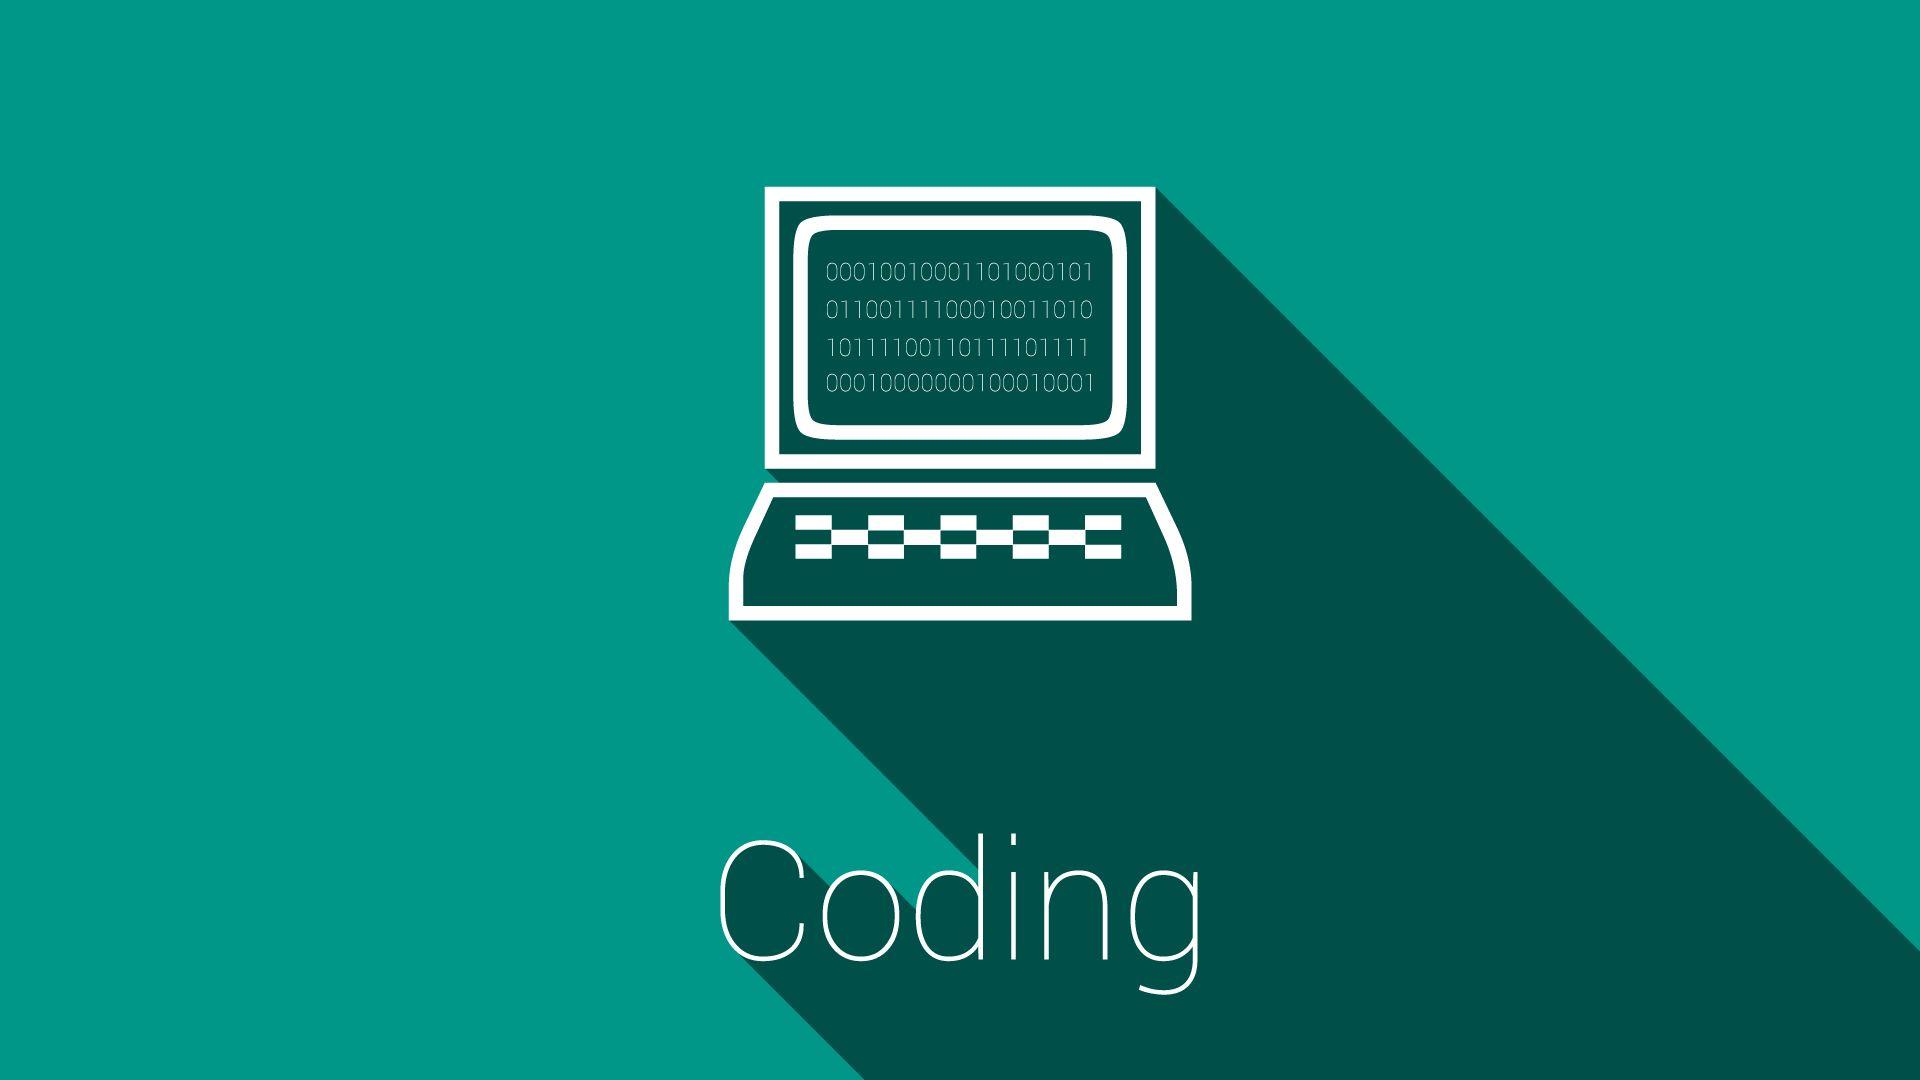 Coding wallpaper pc